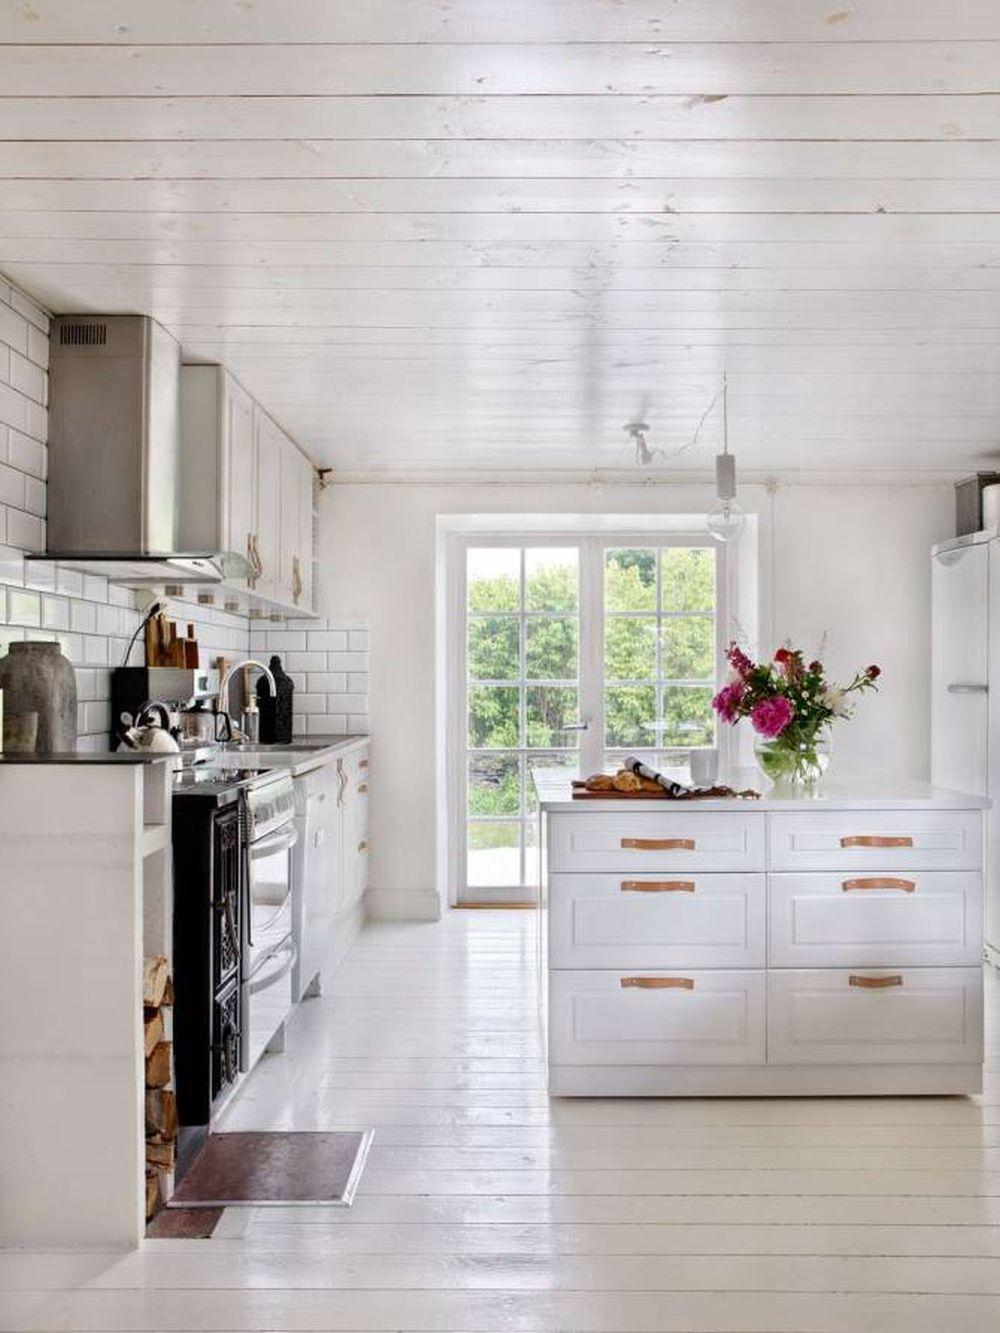 adelaparvu.com despre casa cu sarm rustic, Suedia, Foto Jonas Lundberg (1)